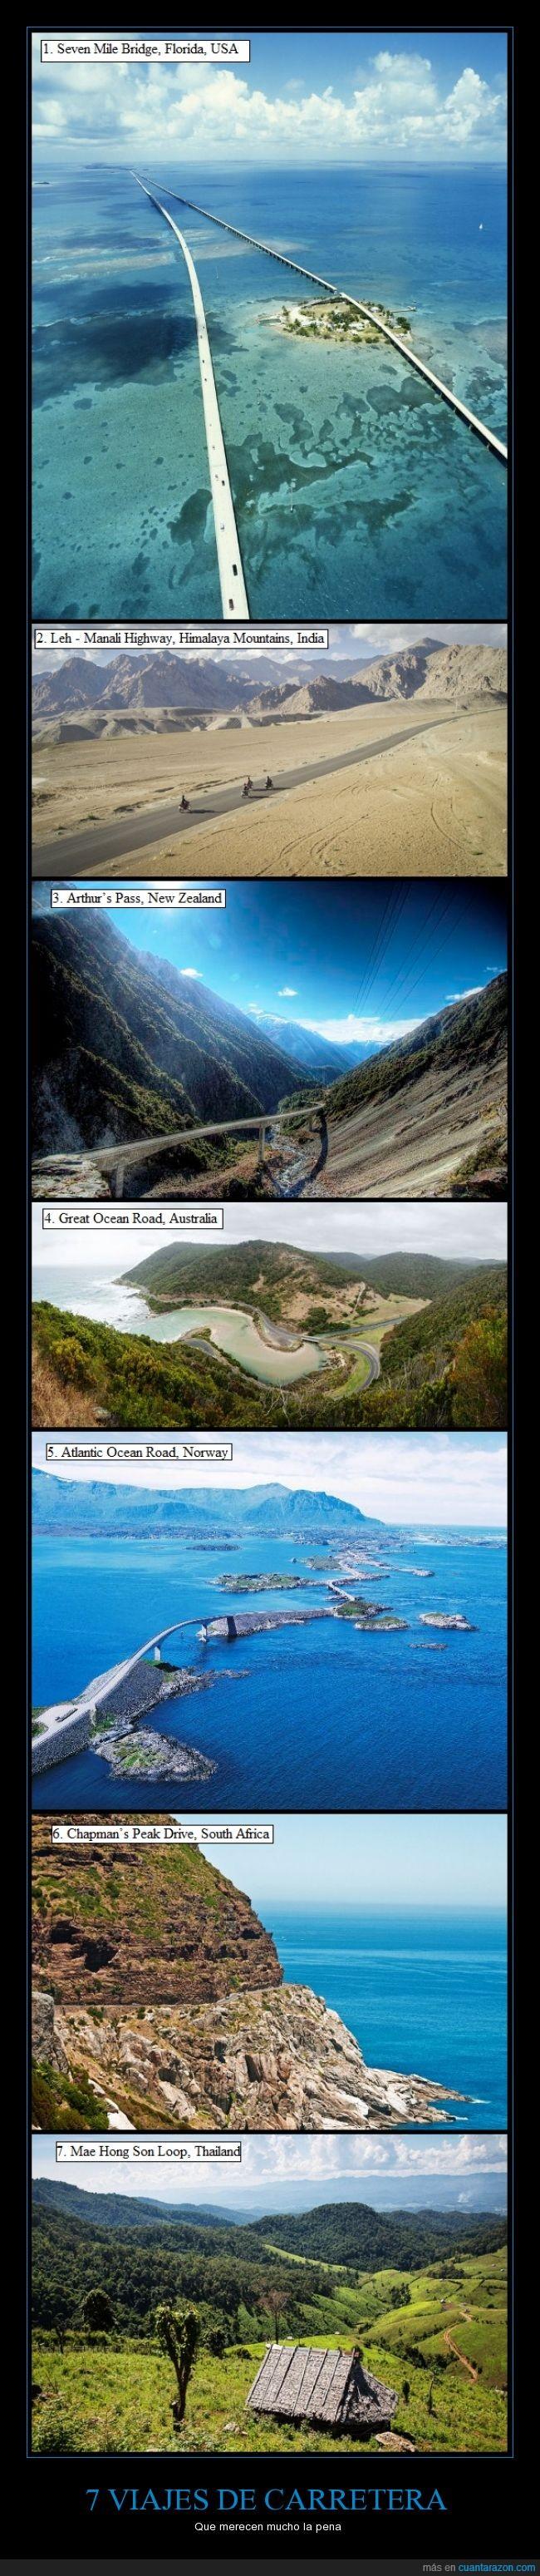 carretera,coche,destino,fregoneta con colegas,noruega,tailandia,viaje